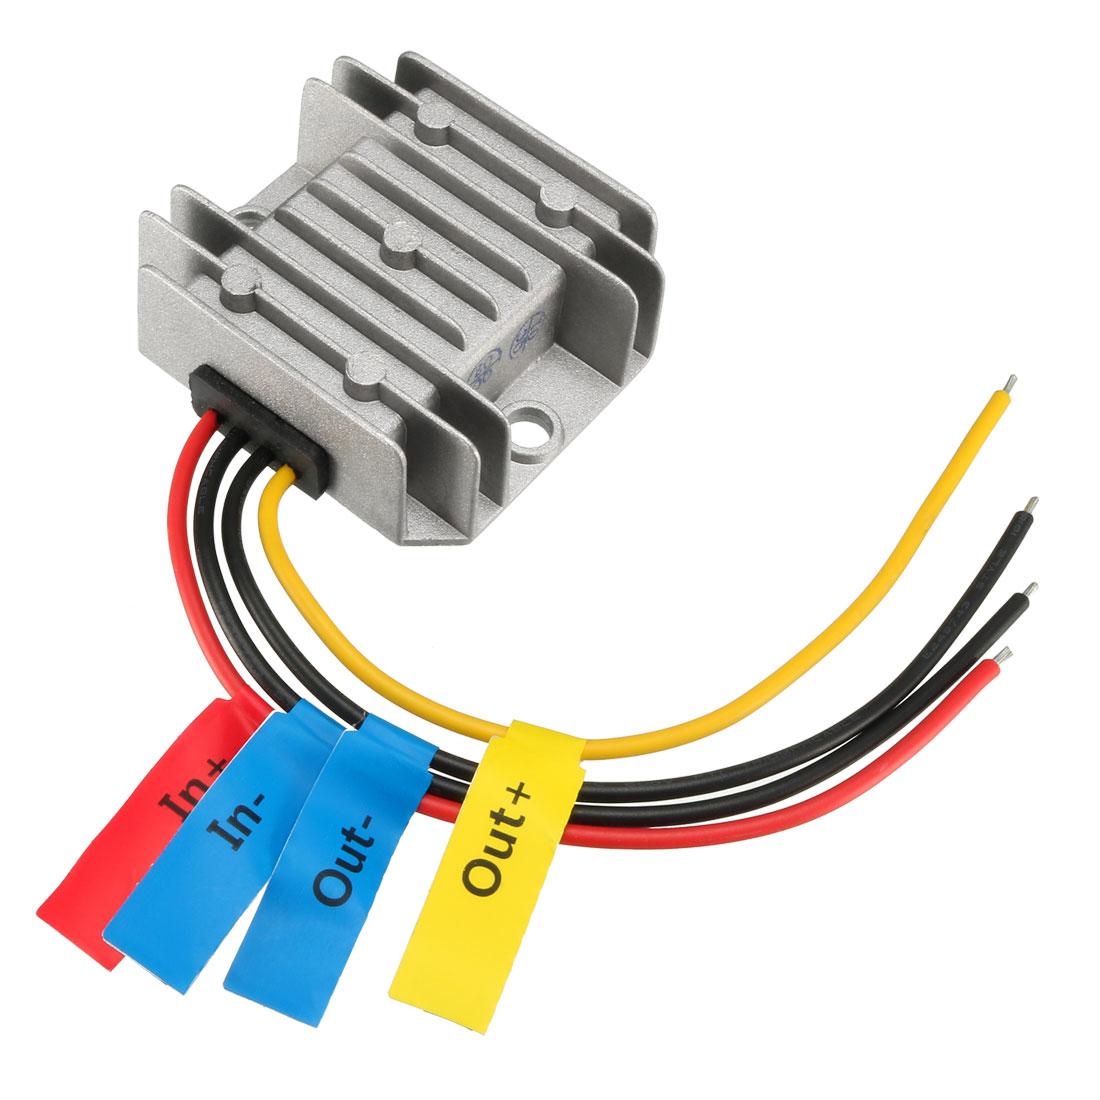 uxcell Voltage Reducer Converter Regulator DC 12V to DC 48V 1A 48W Power Boost